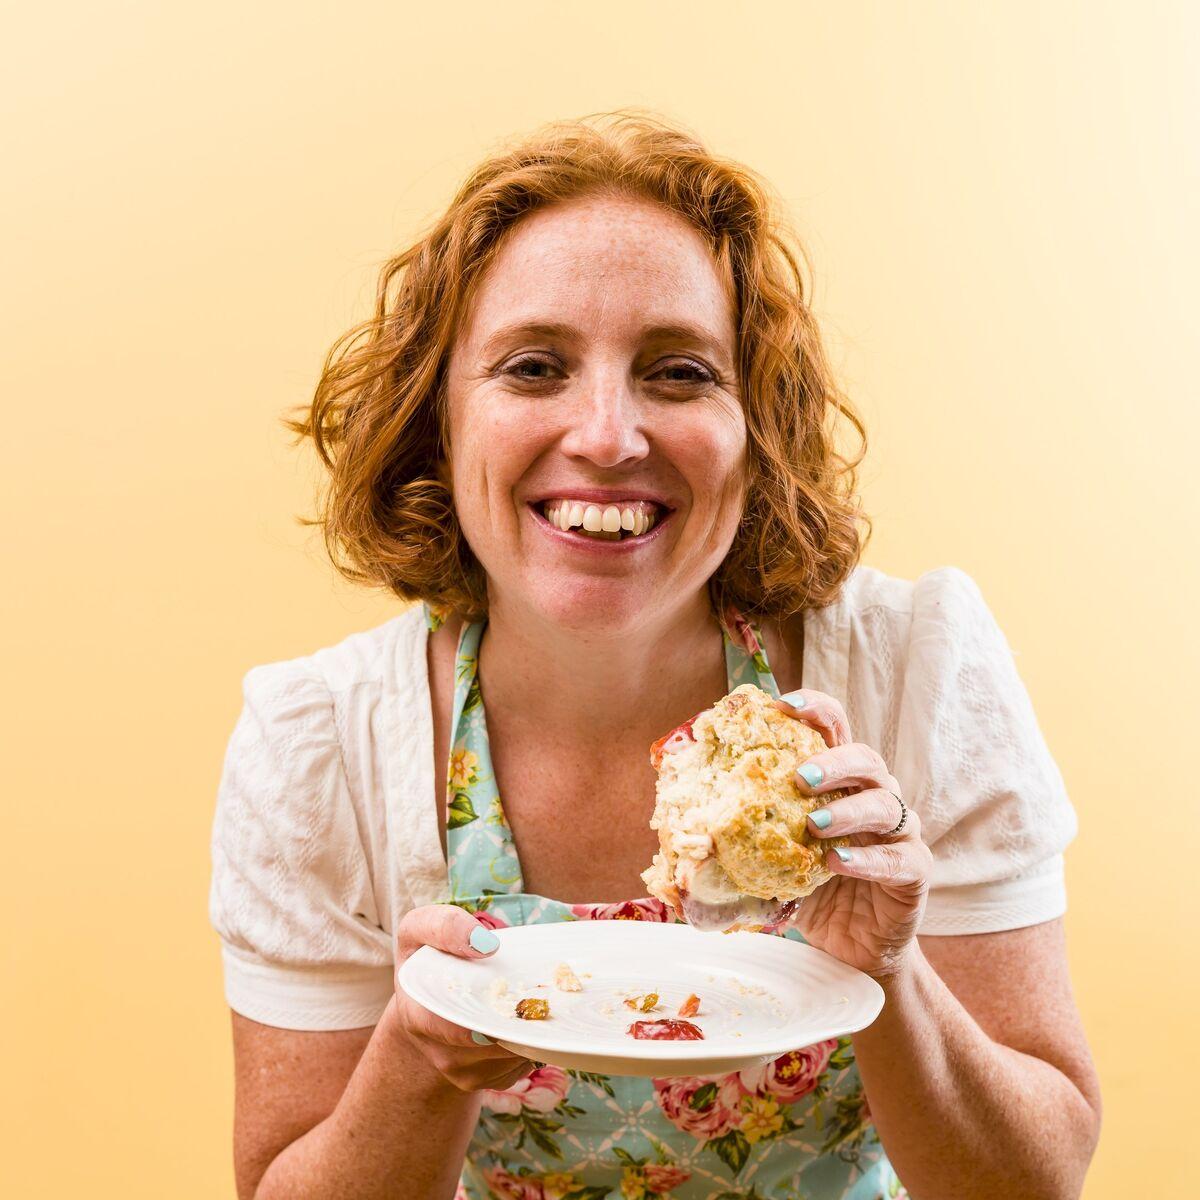 Stefani Pollack holding a clotted cream ice cream sandwich